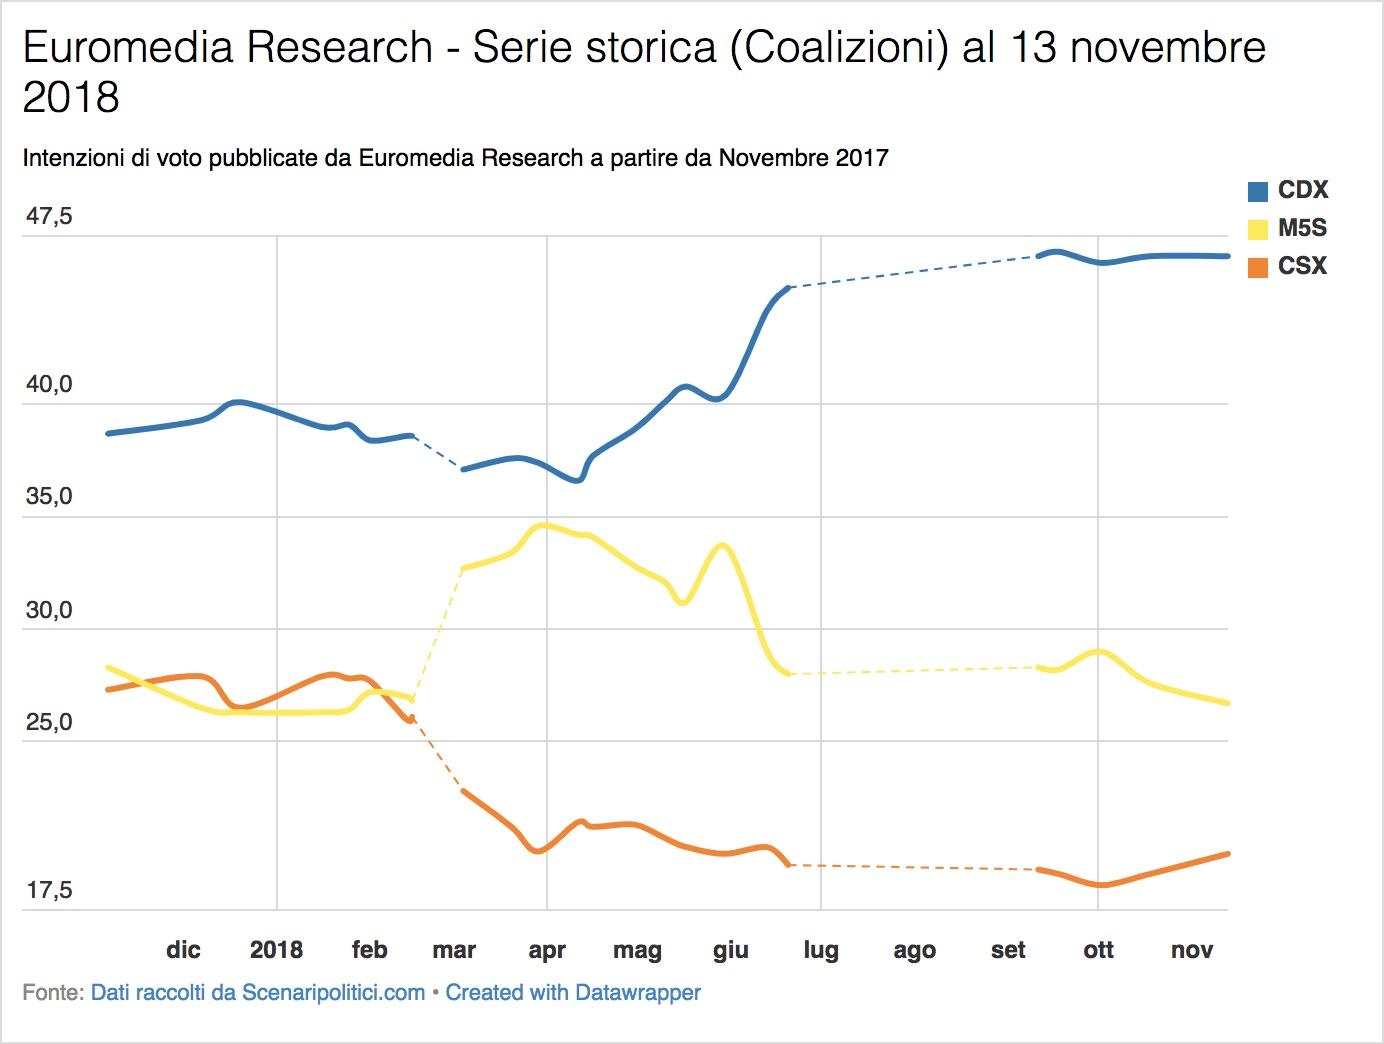 Sondaggi Euromedia Research & Piepoli (13 novembre 2018)